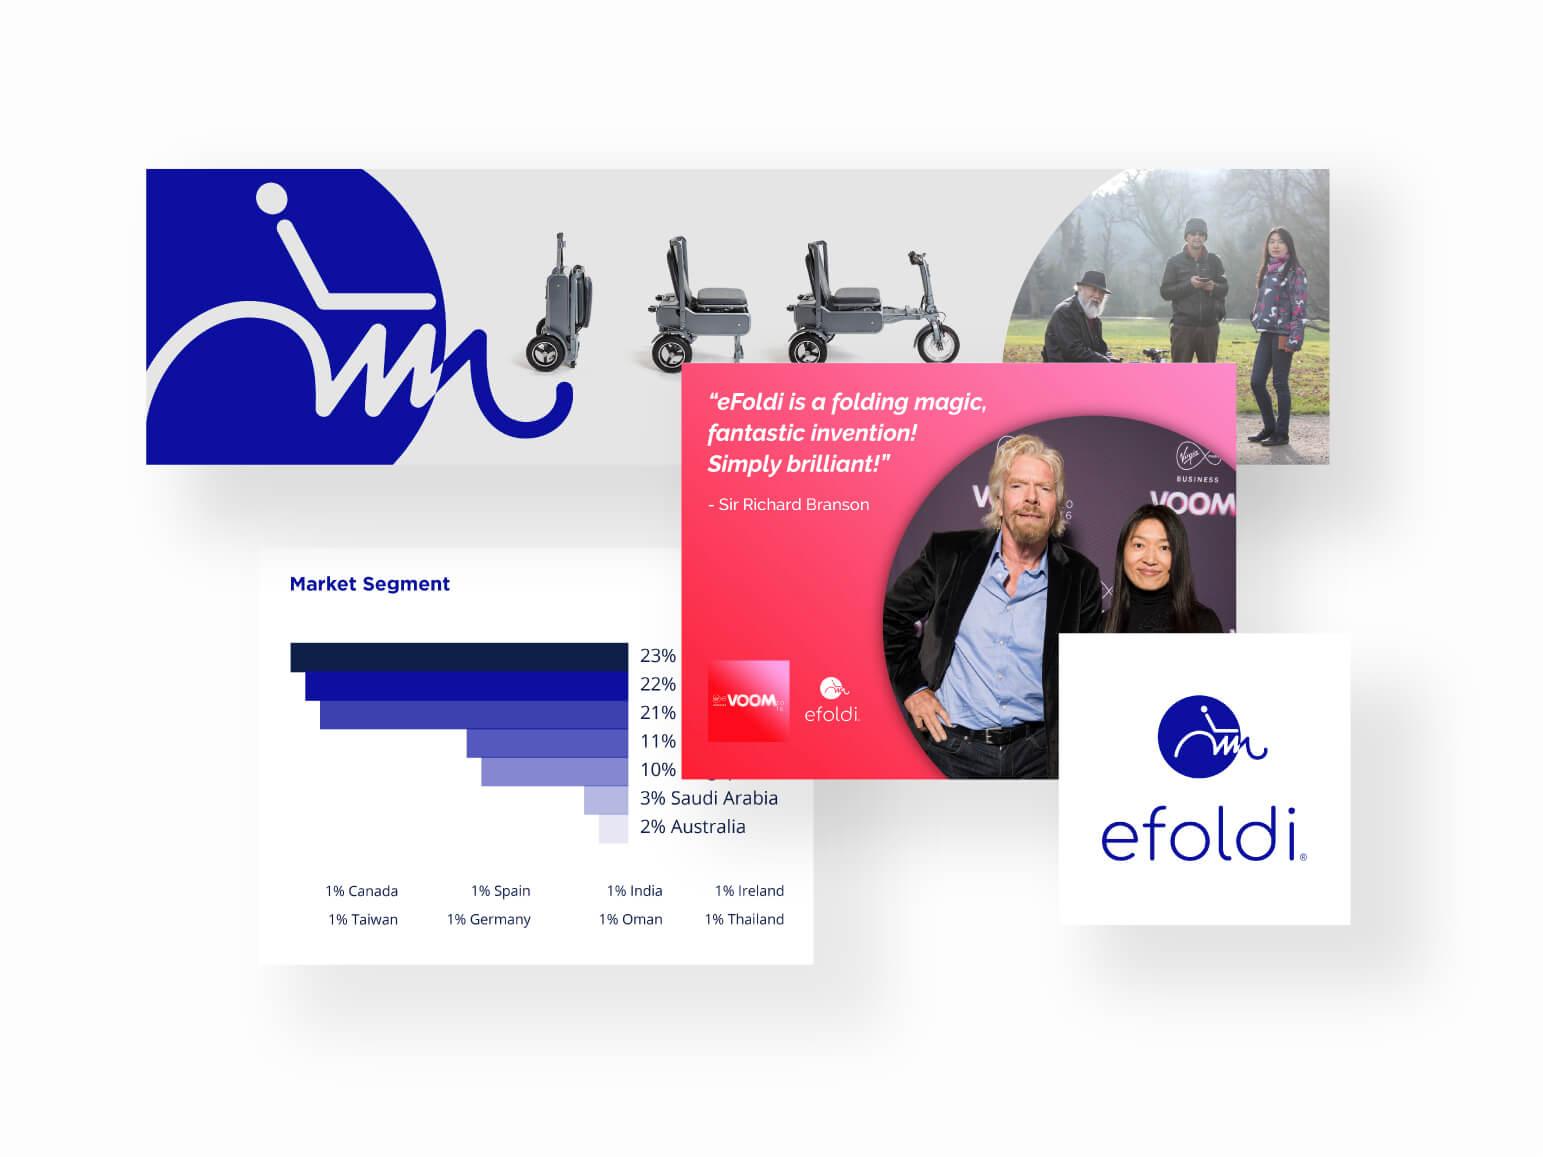 Serkan_Ferah_Branding_Pitching_Design_London_eFoldi-rebranding-crowdfunding-marketing-pitching-pitch-design-03.jpg